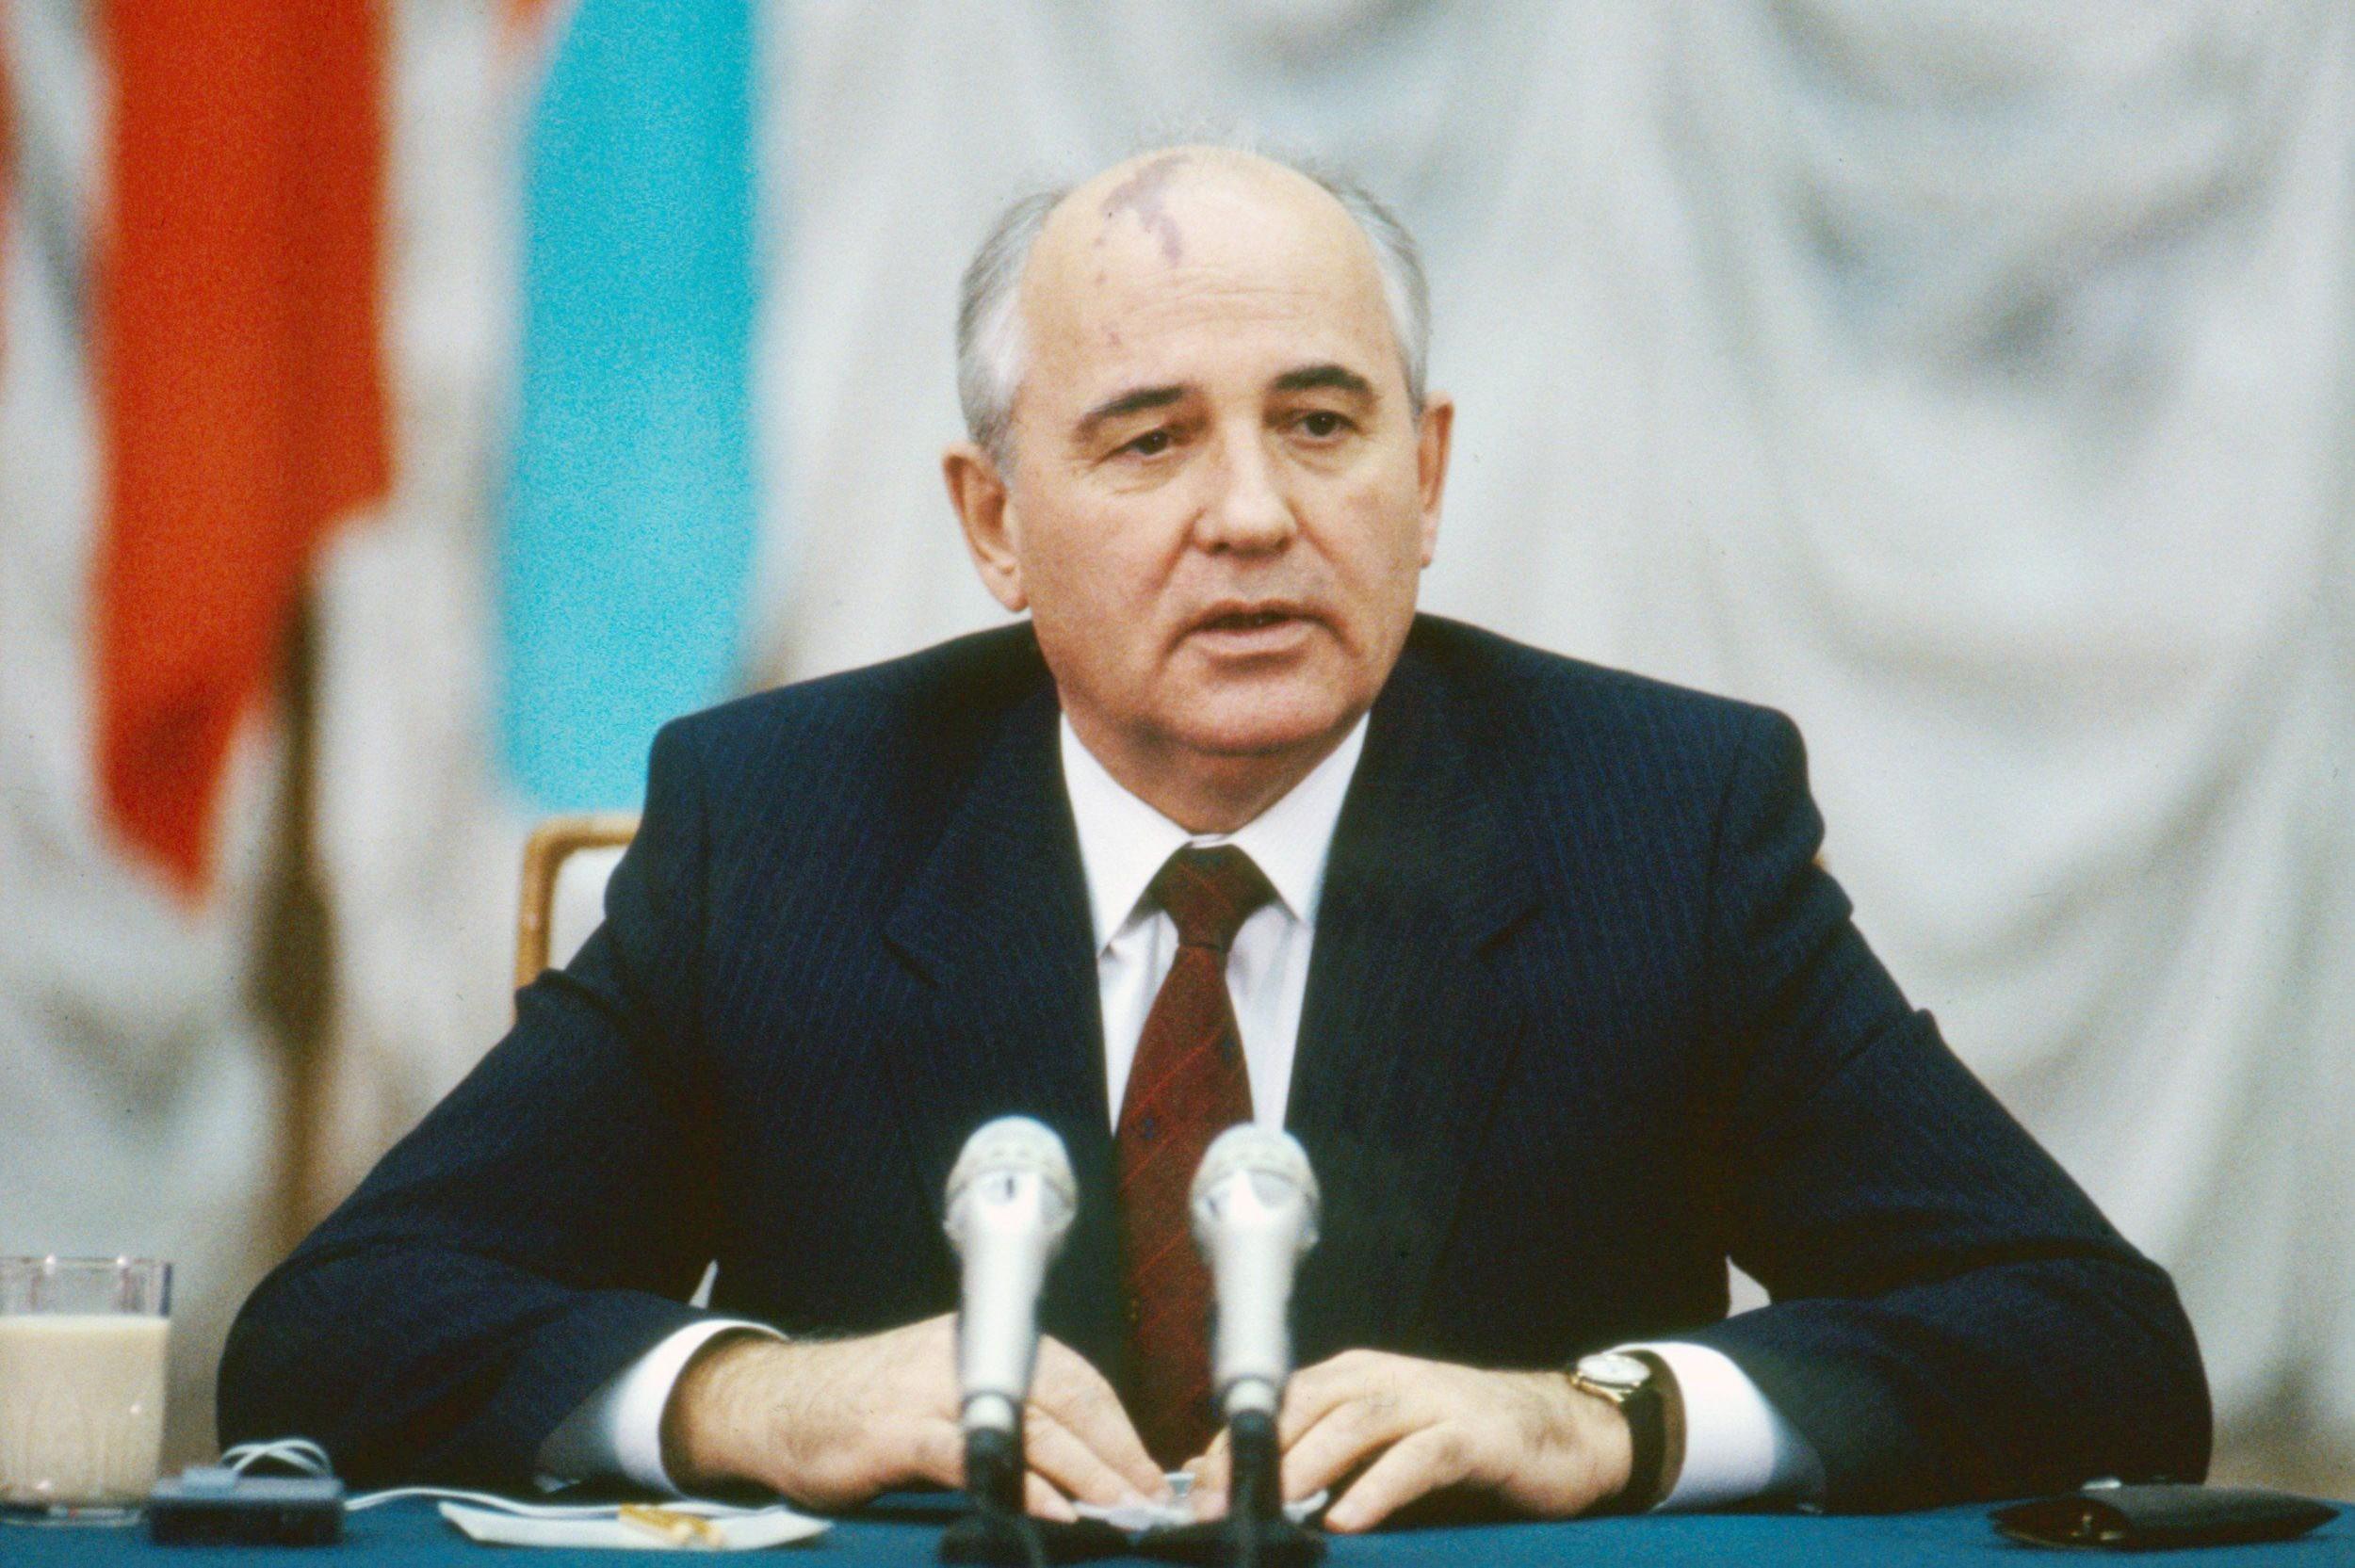 Михаил Горбачов, последњи комунистички лидер Советског Савеза (Фото: Getty Images)